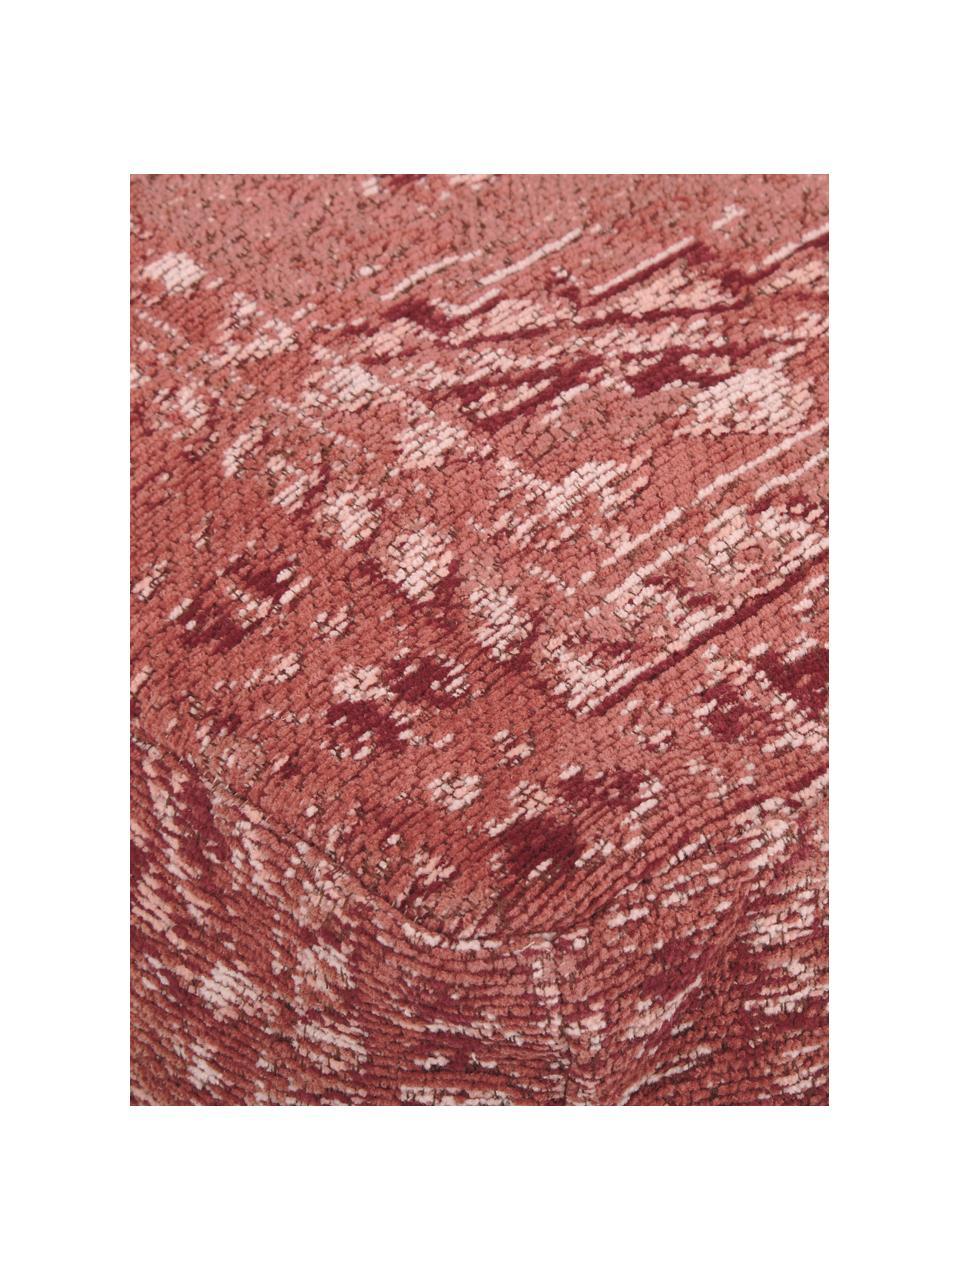 Vintage vloerkussen Rebel, Bekleding: 95% katoen, 5% polyester, Roodbruin, crèmekleurig, rood, 70 x 26 cm